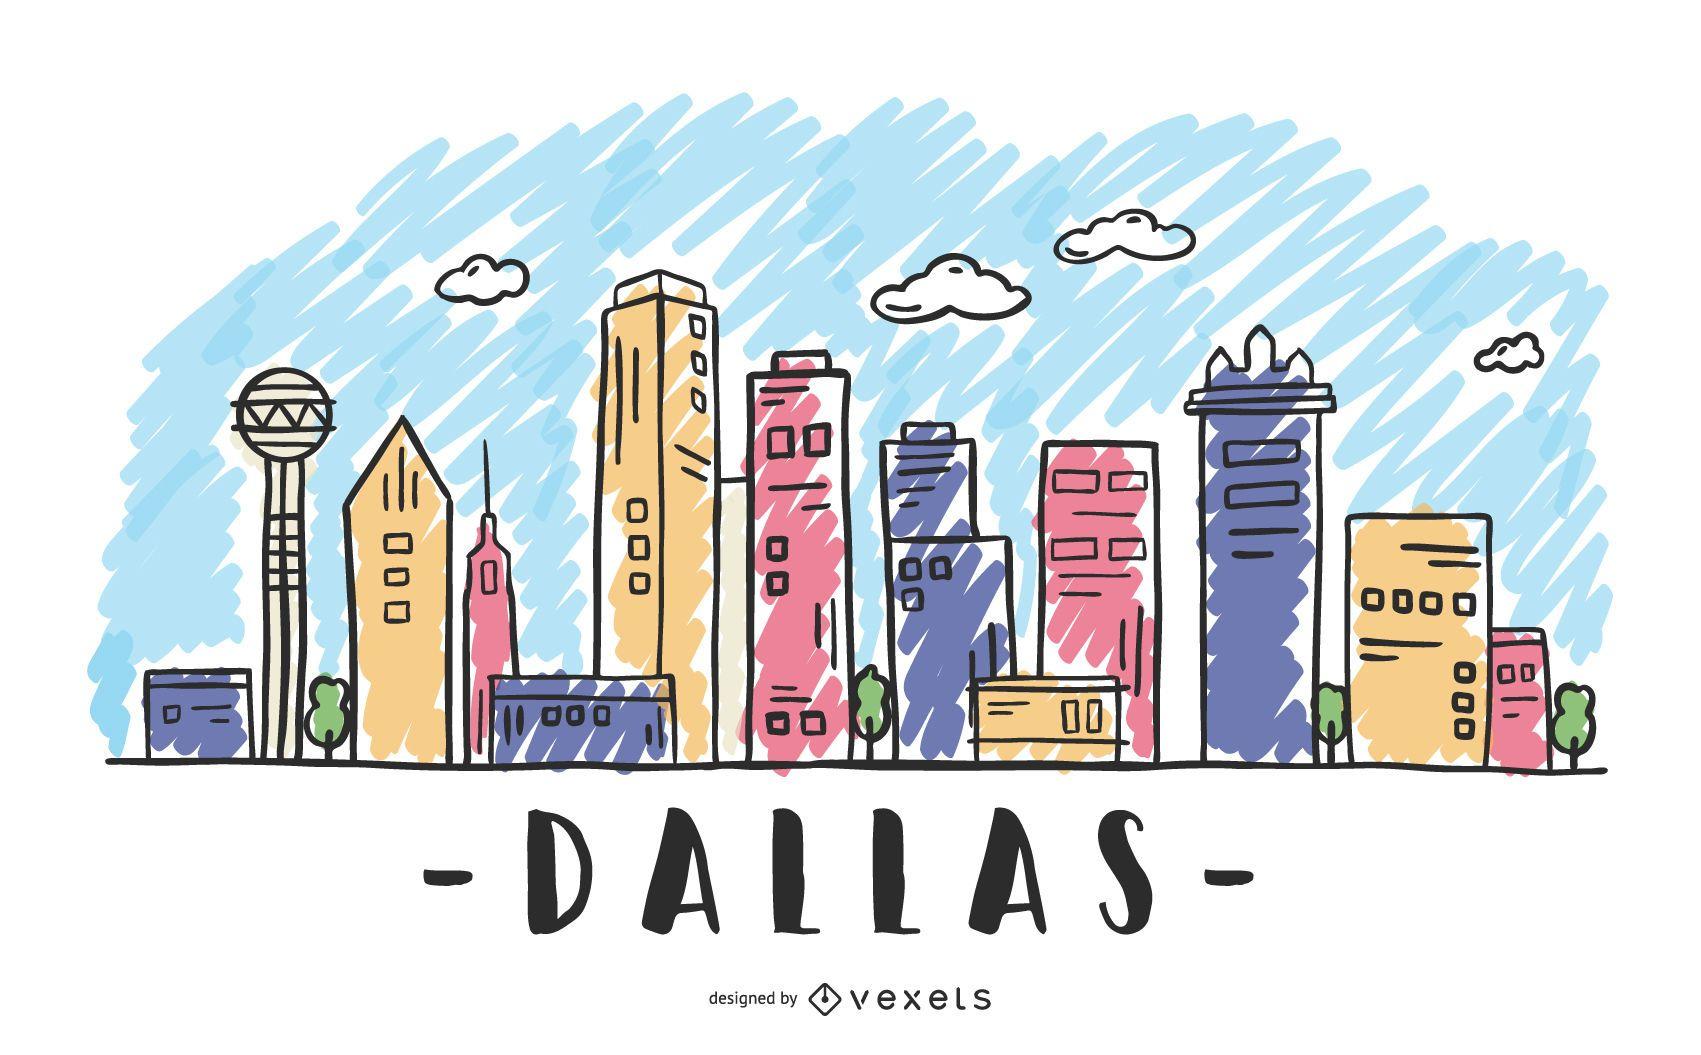 Dallas Texas Skyline Design